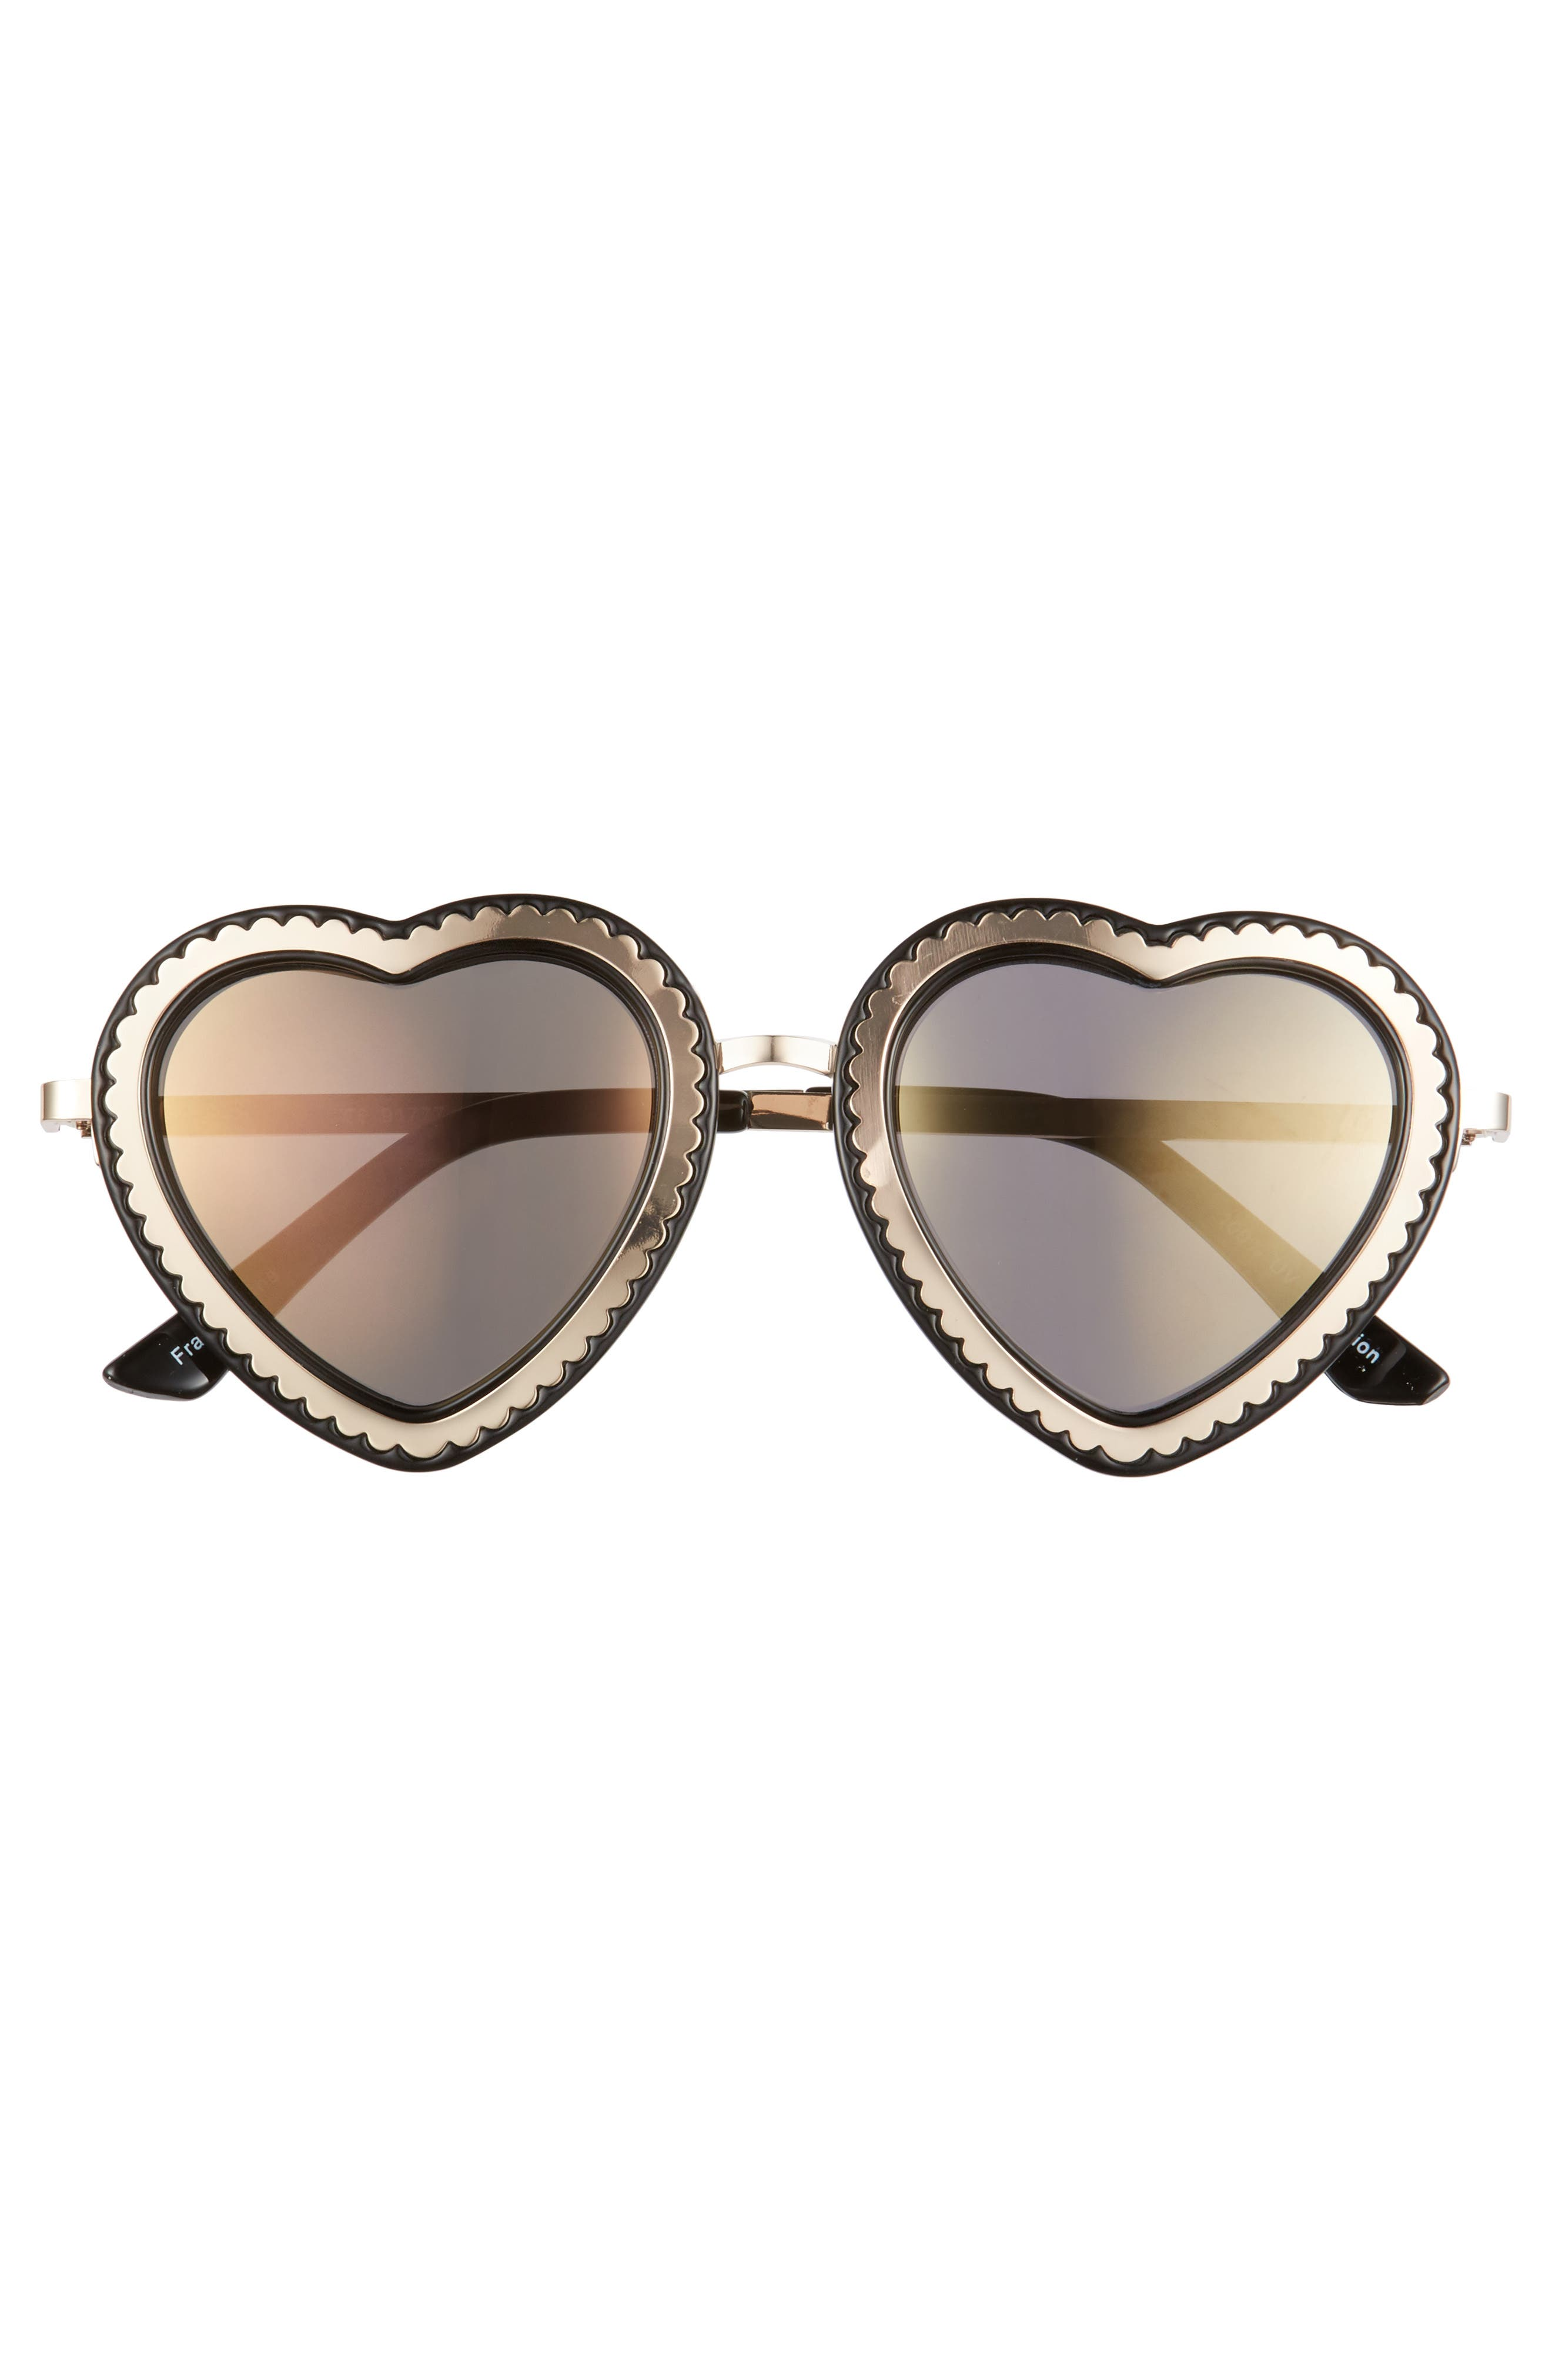 61mm Mirrored Heart Sunglasses,                             Alternate thumbnail 3, color,                             Gold/ Black